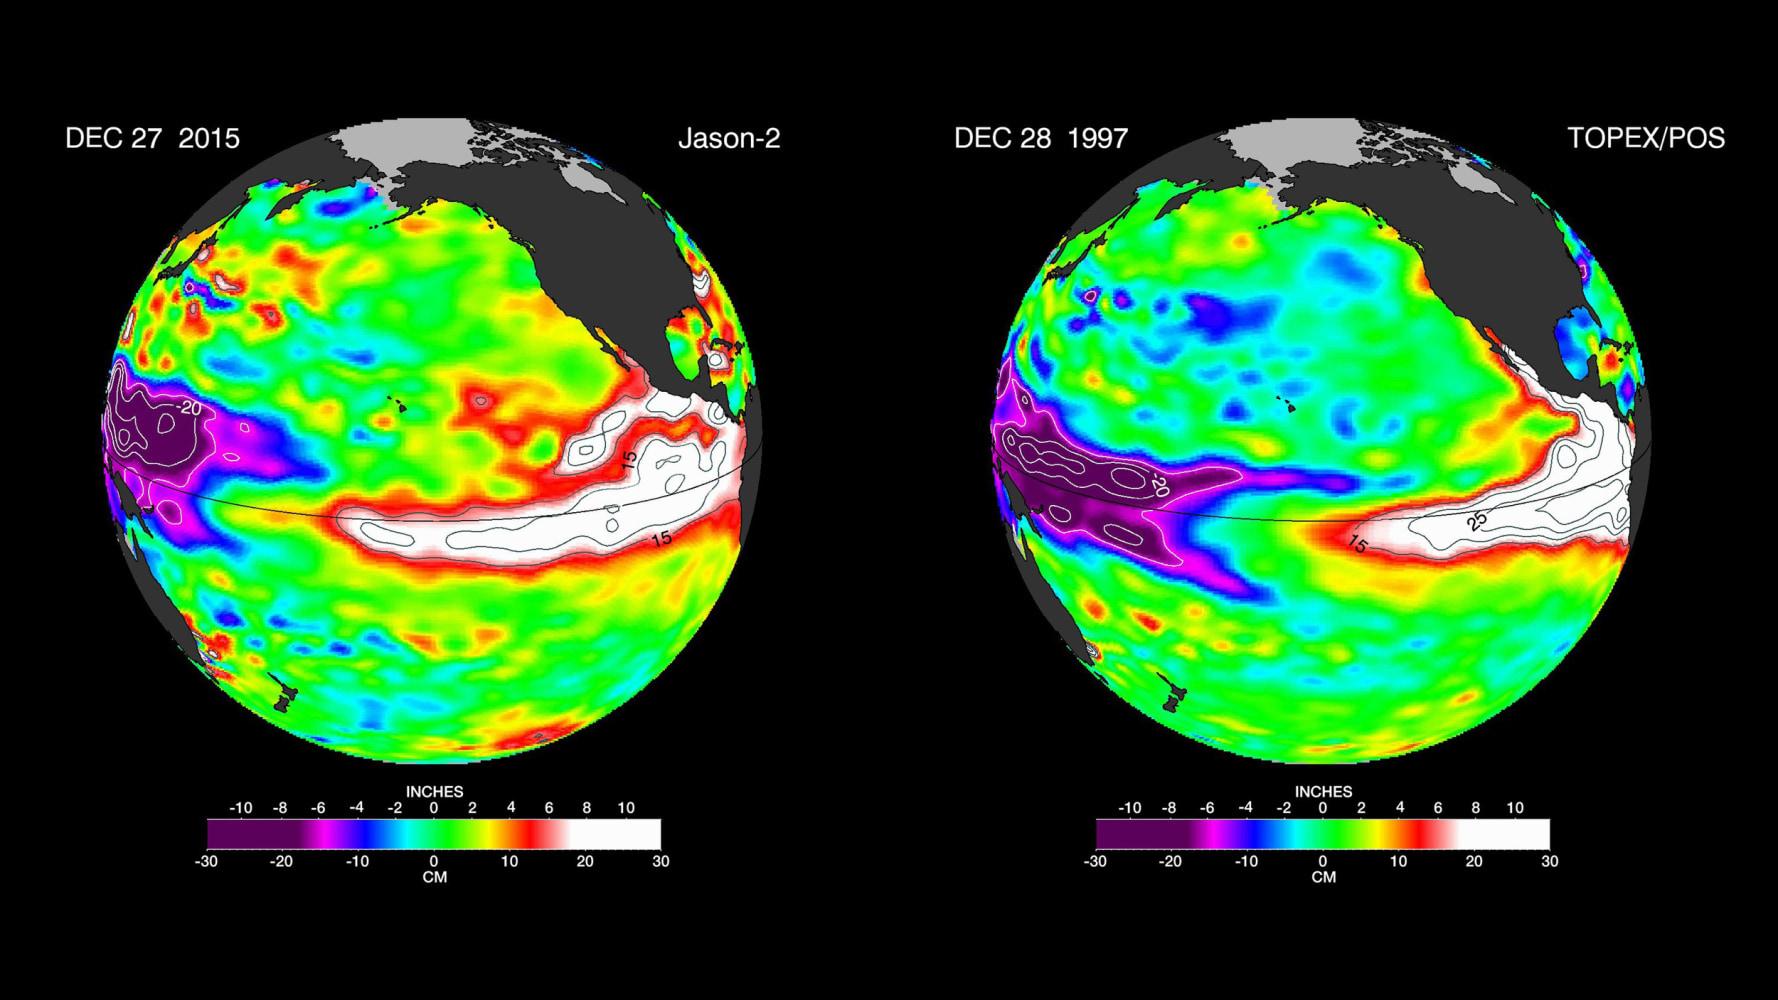 Sick of El Niño? You Ain't Seen Nothing Yet, Warns NASA